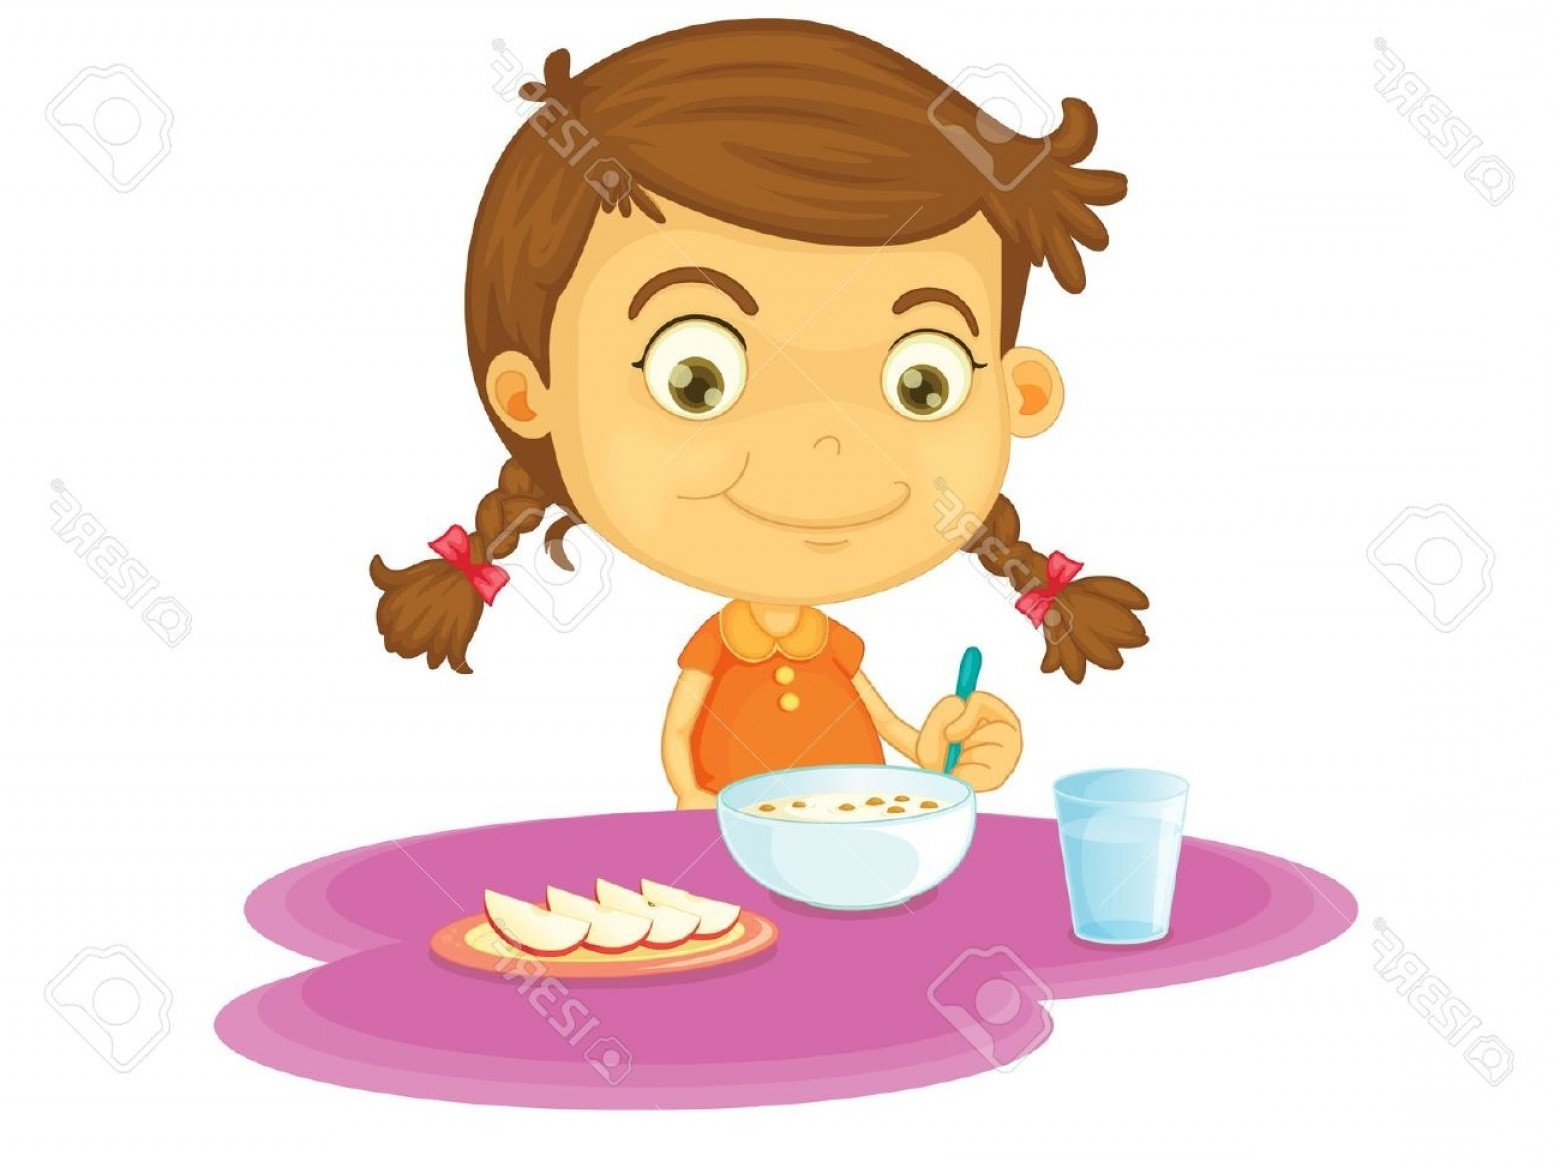 Breakfast clipart kid. Child eating